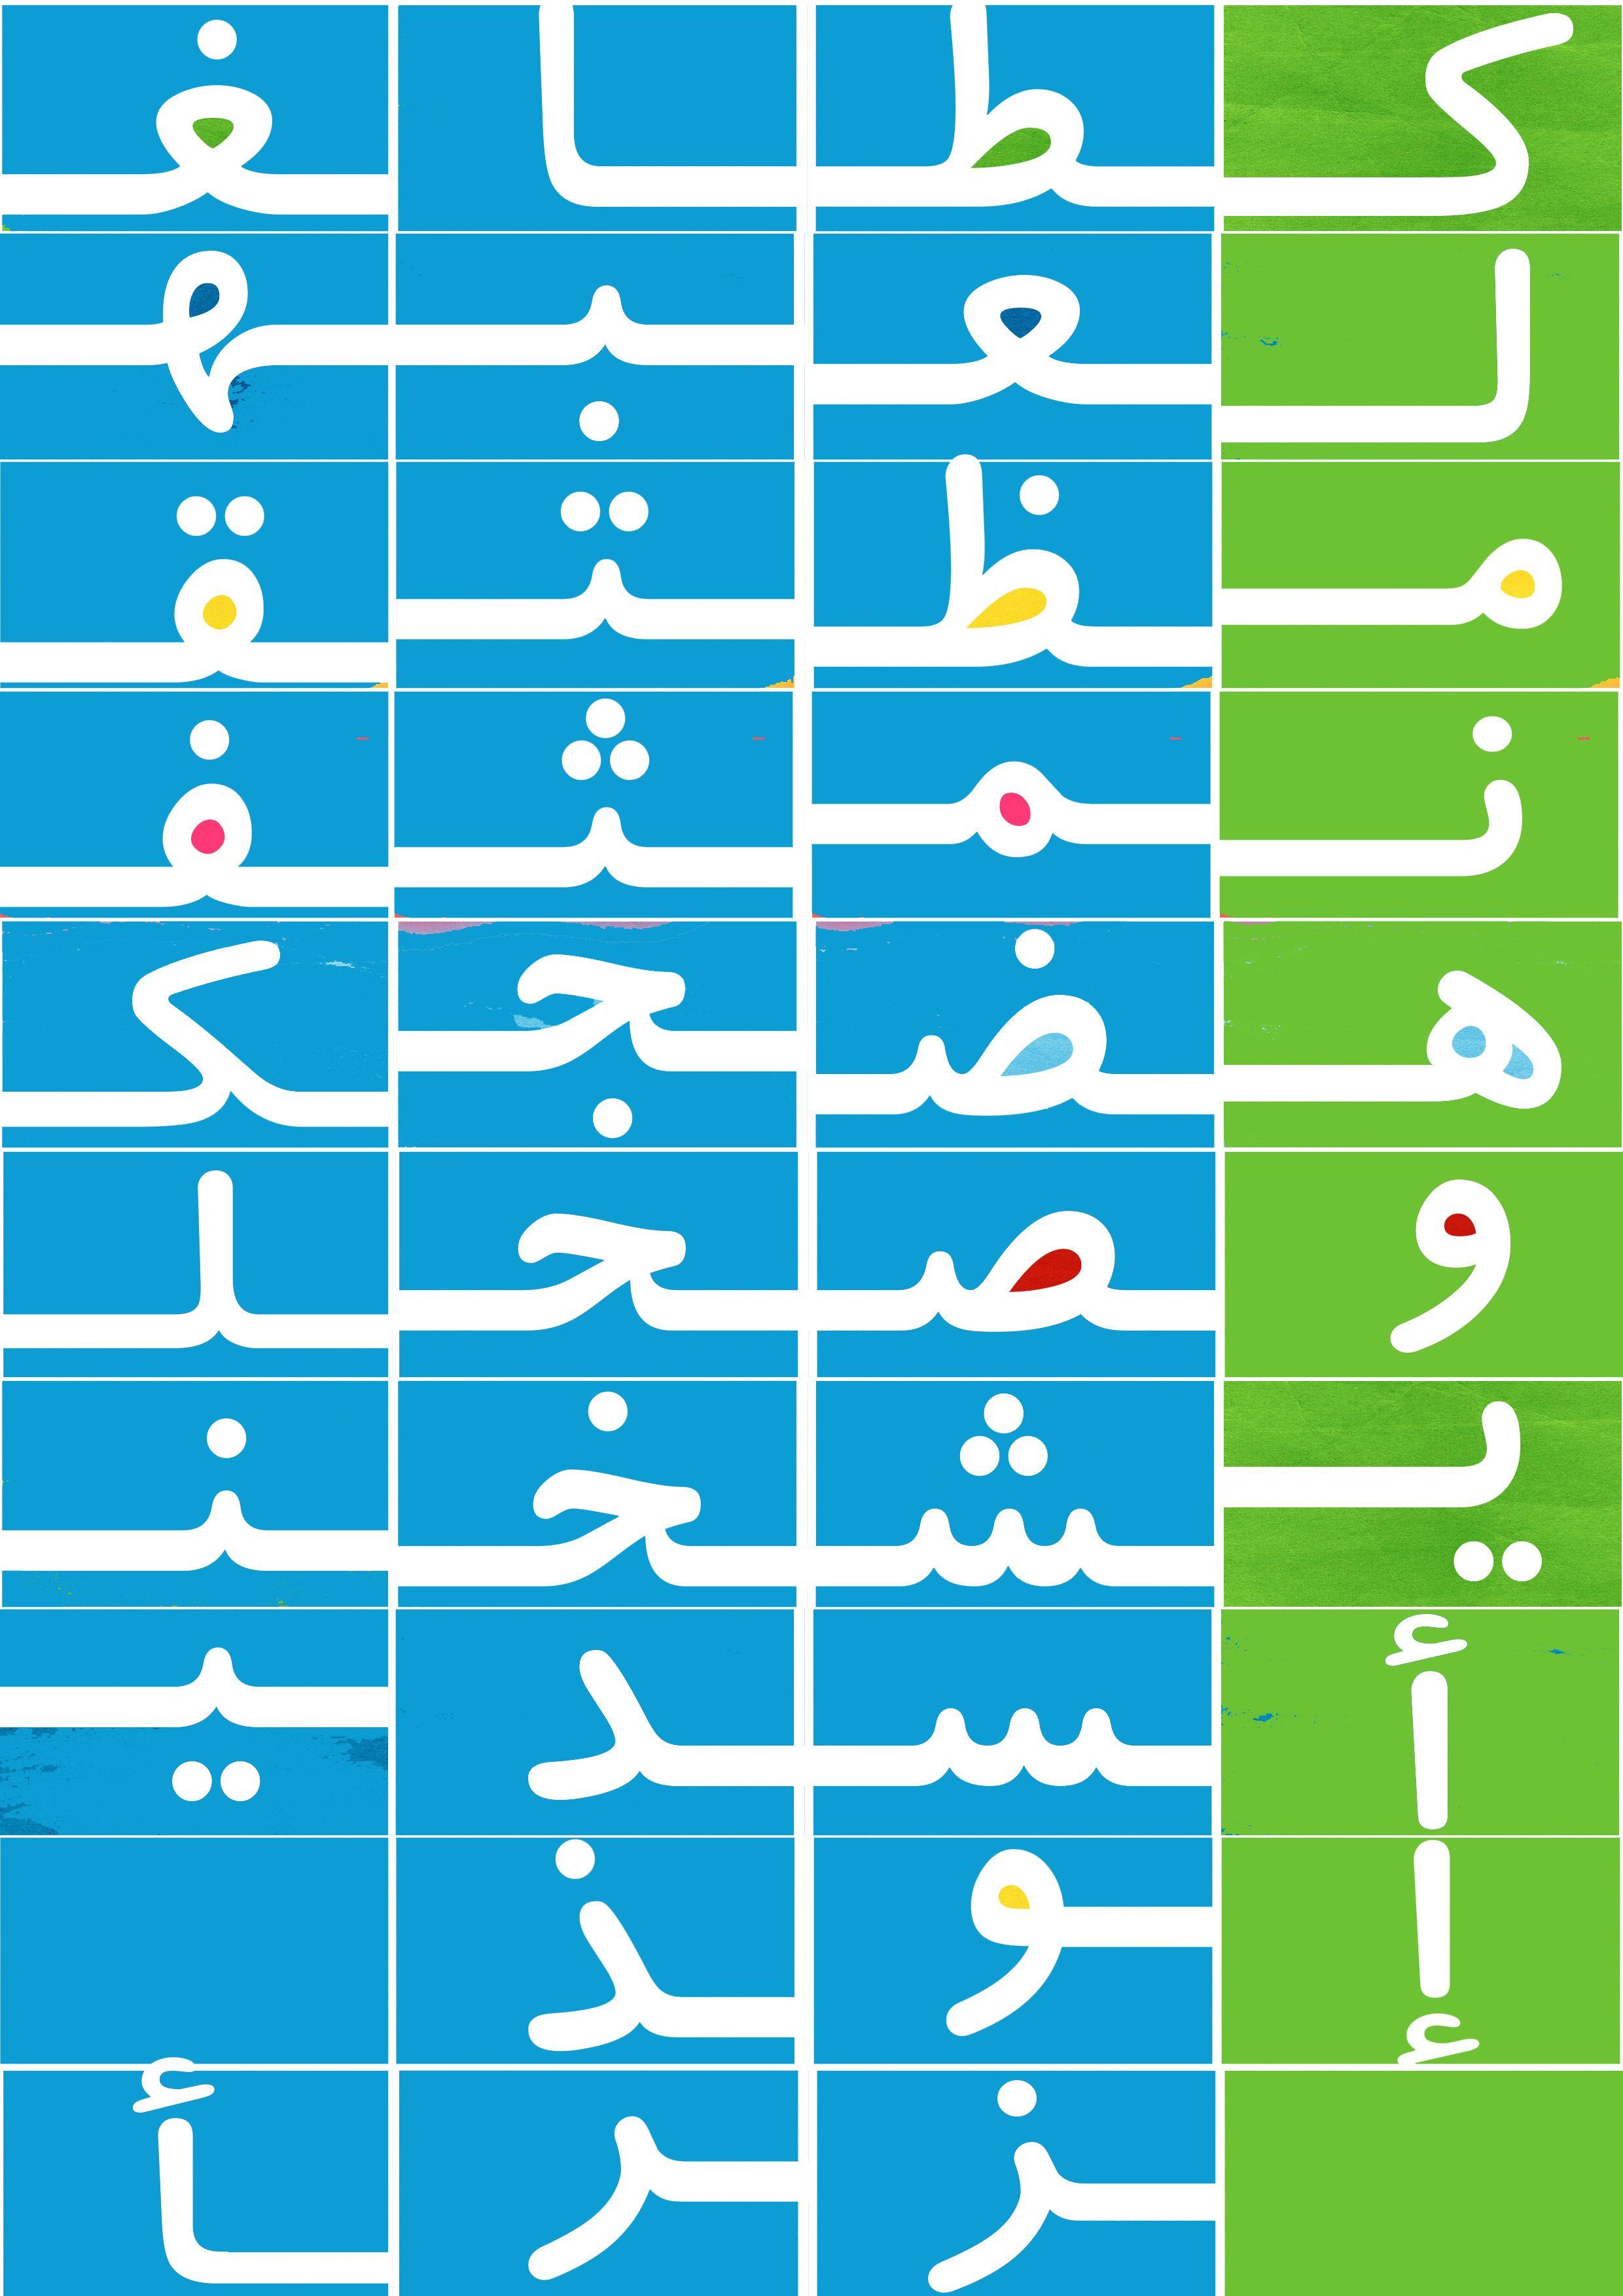 Pin By Maryam Ben On أوراق خاصة بفيديو اليوتيوب Arabic Alphabet Letters Learning Arabic Lettering Alphabet